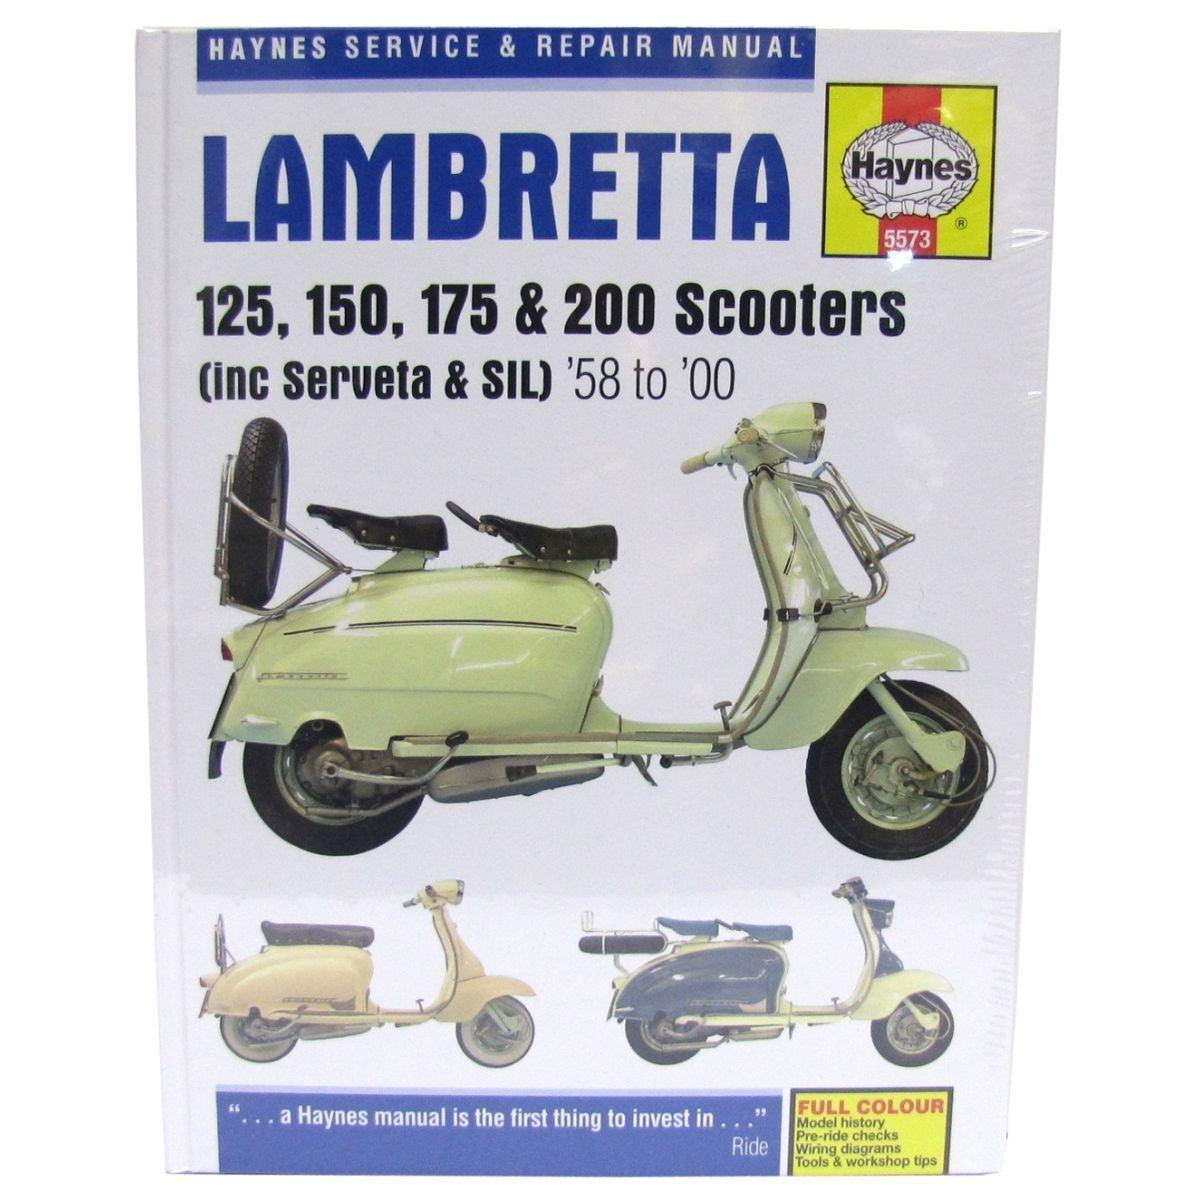 Manual Haynes For 1966 Lambretta Li 125 Series Iii Ebay Wiring Diagram Vespa Px150e Norton Secured Powered By Verisign